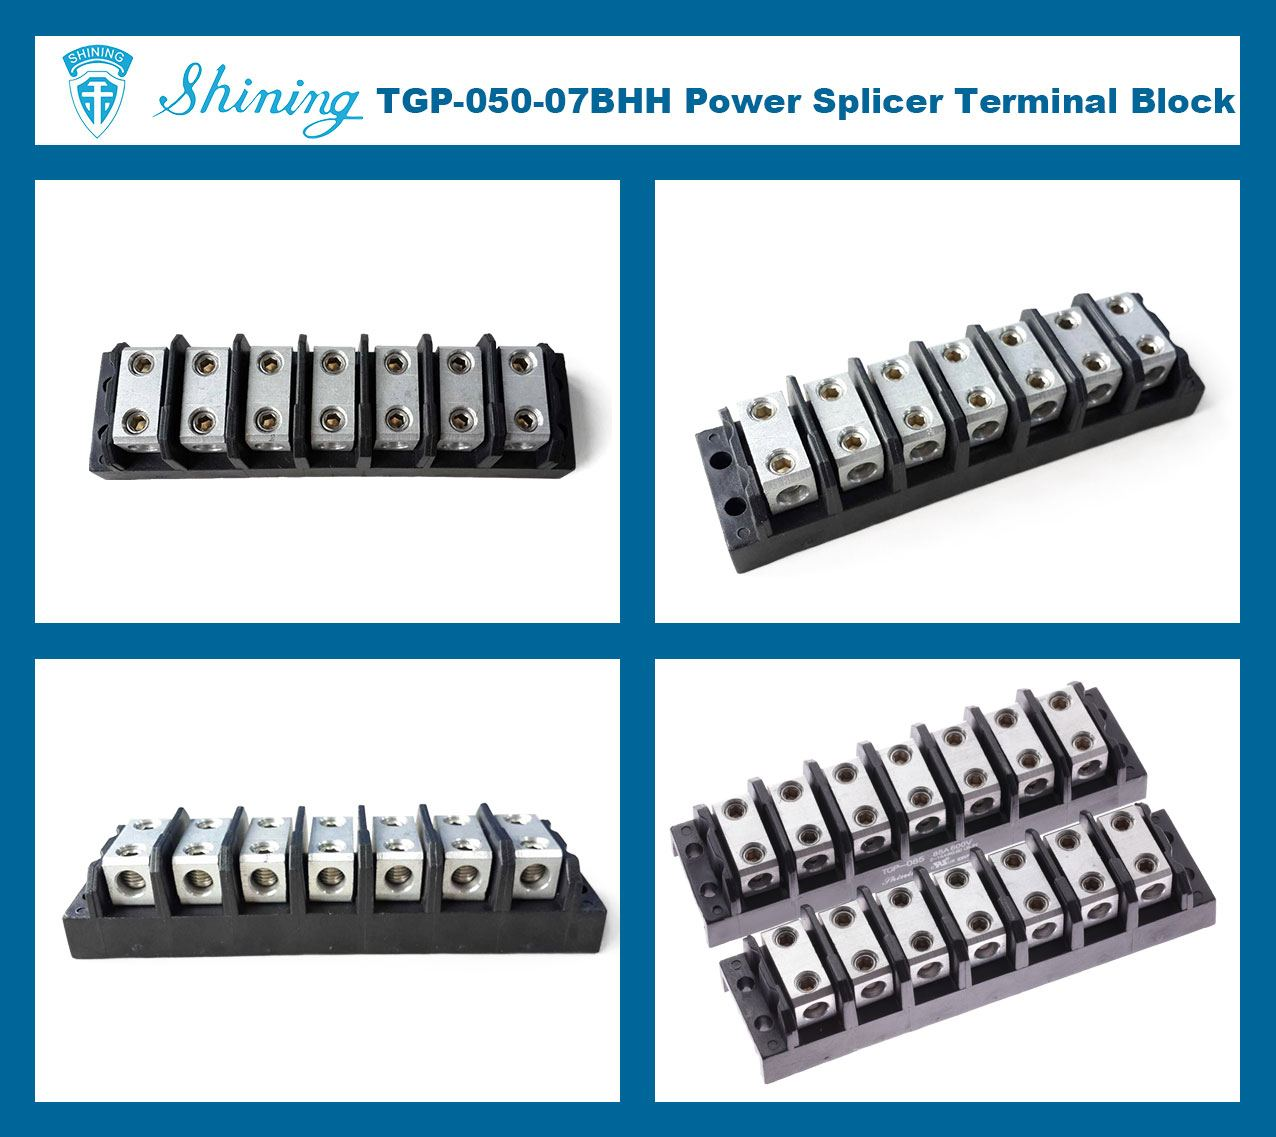 TGP-050-07BHH 600V 50A 7 Way Power Splicer Terminal Block